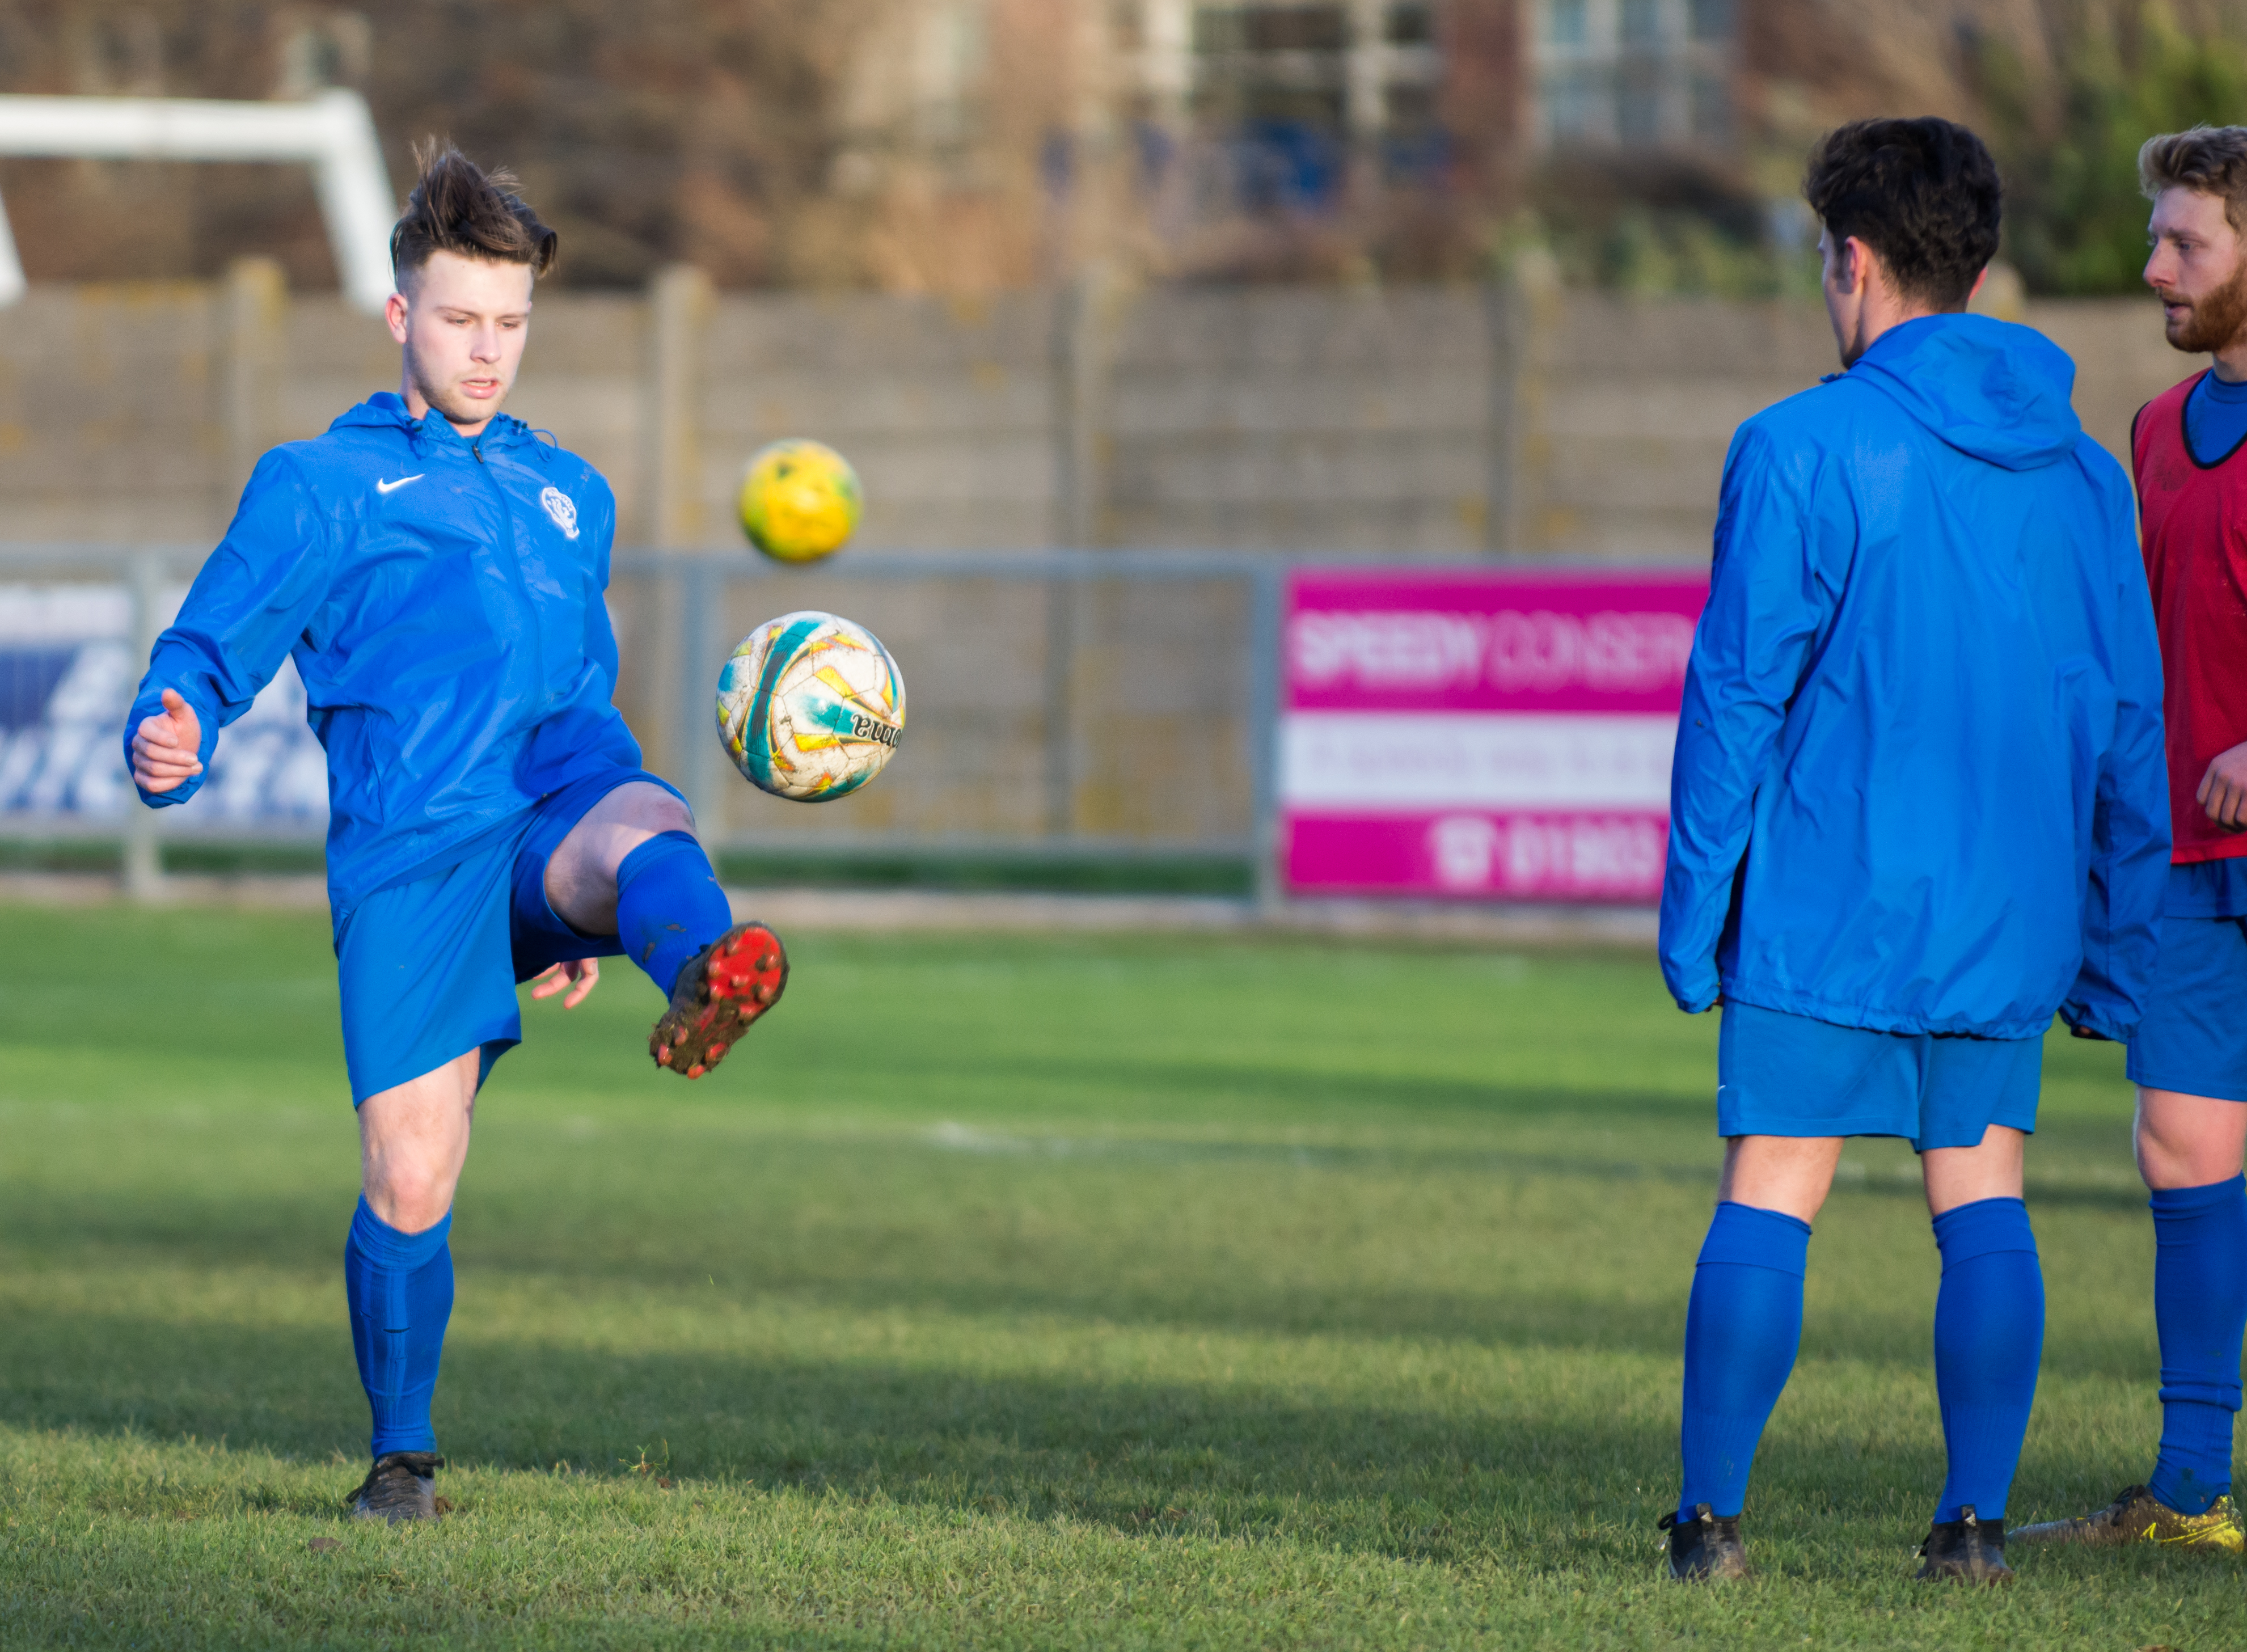 Shoreham FC vs Faversham Town 16.12.17 17